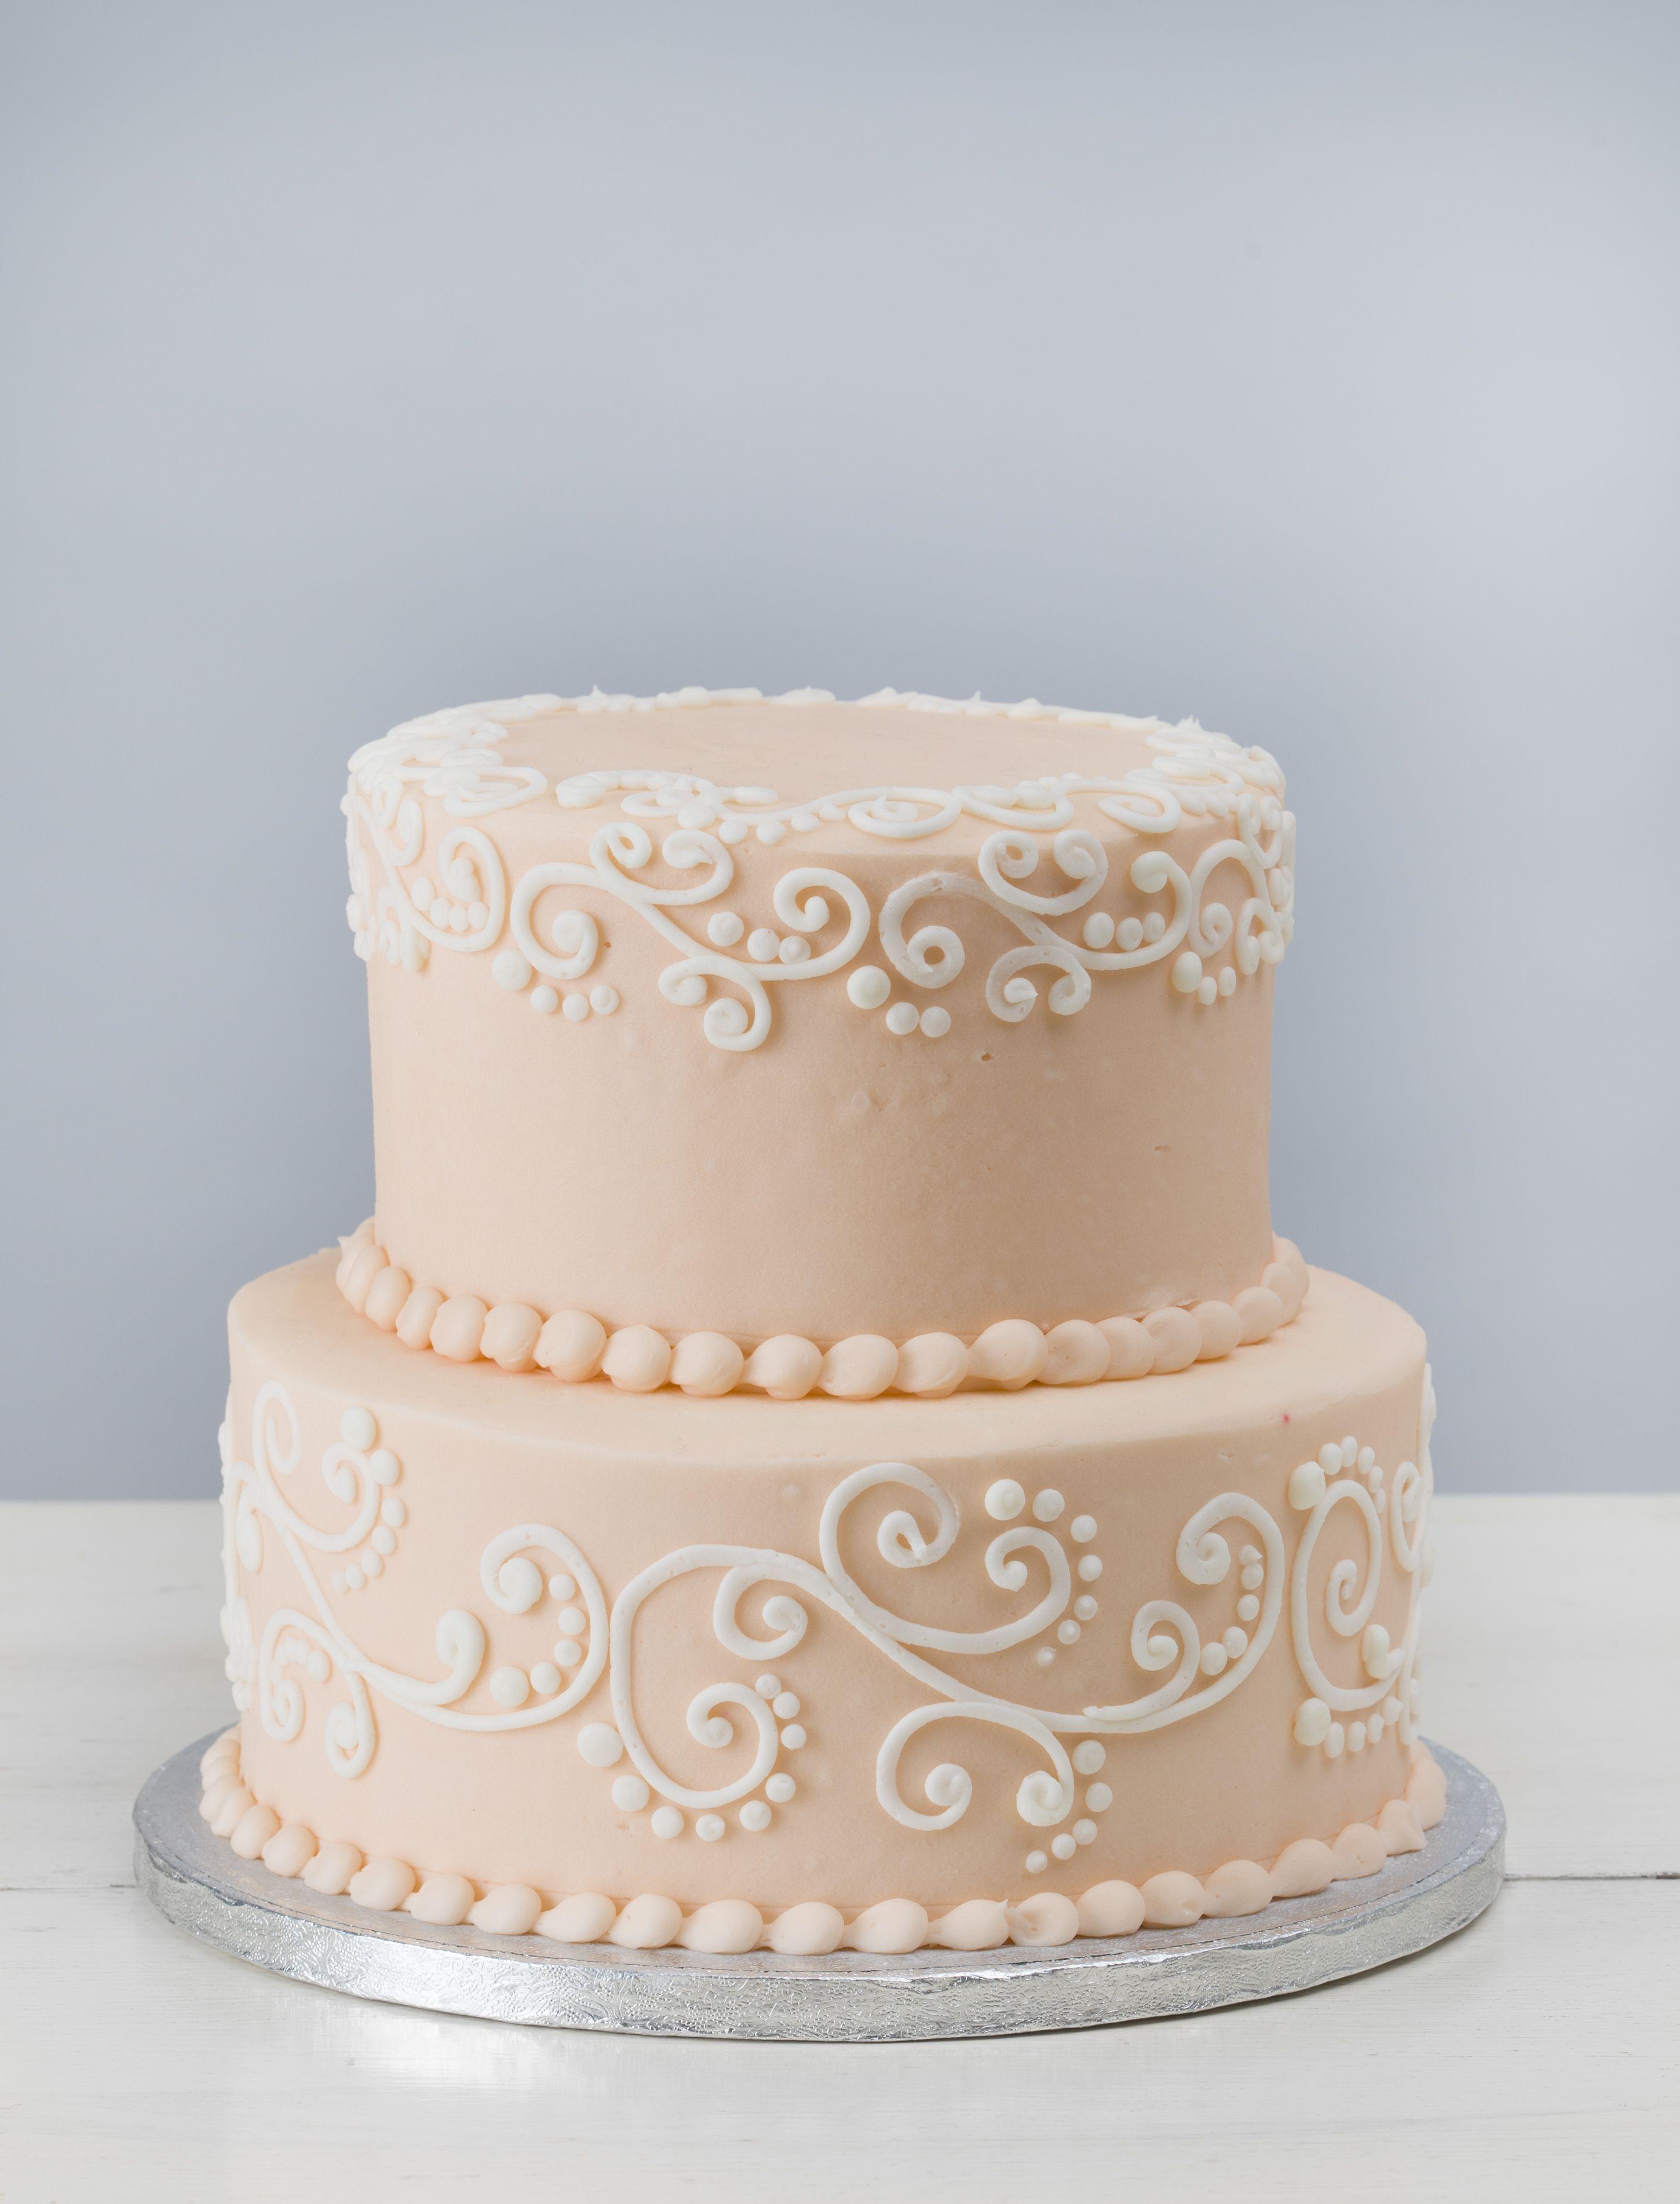 Peach Passion From Martin S Bake Shoppe Wedding Cakes Fantasy Wedding Wedding